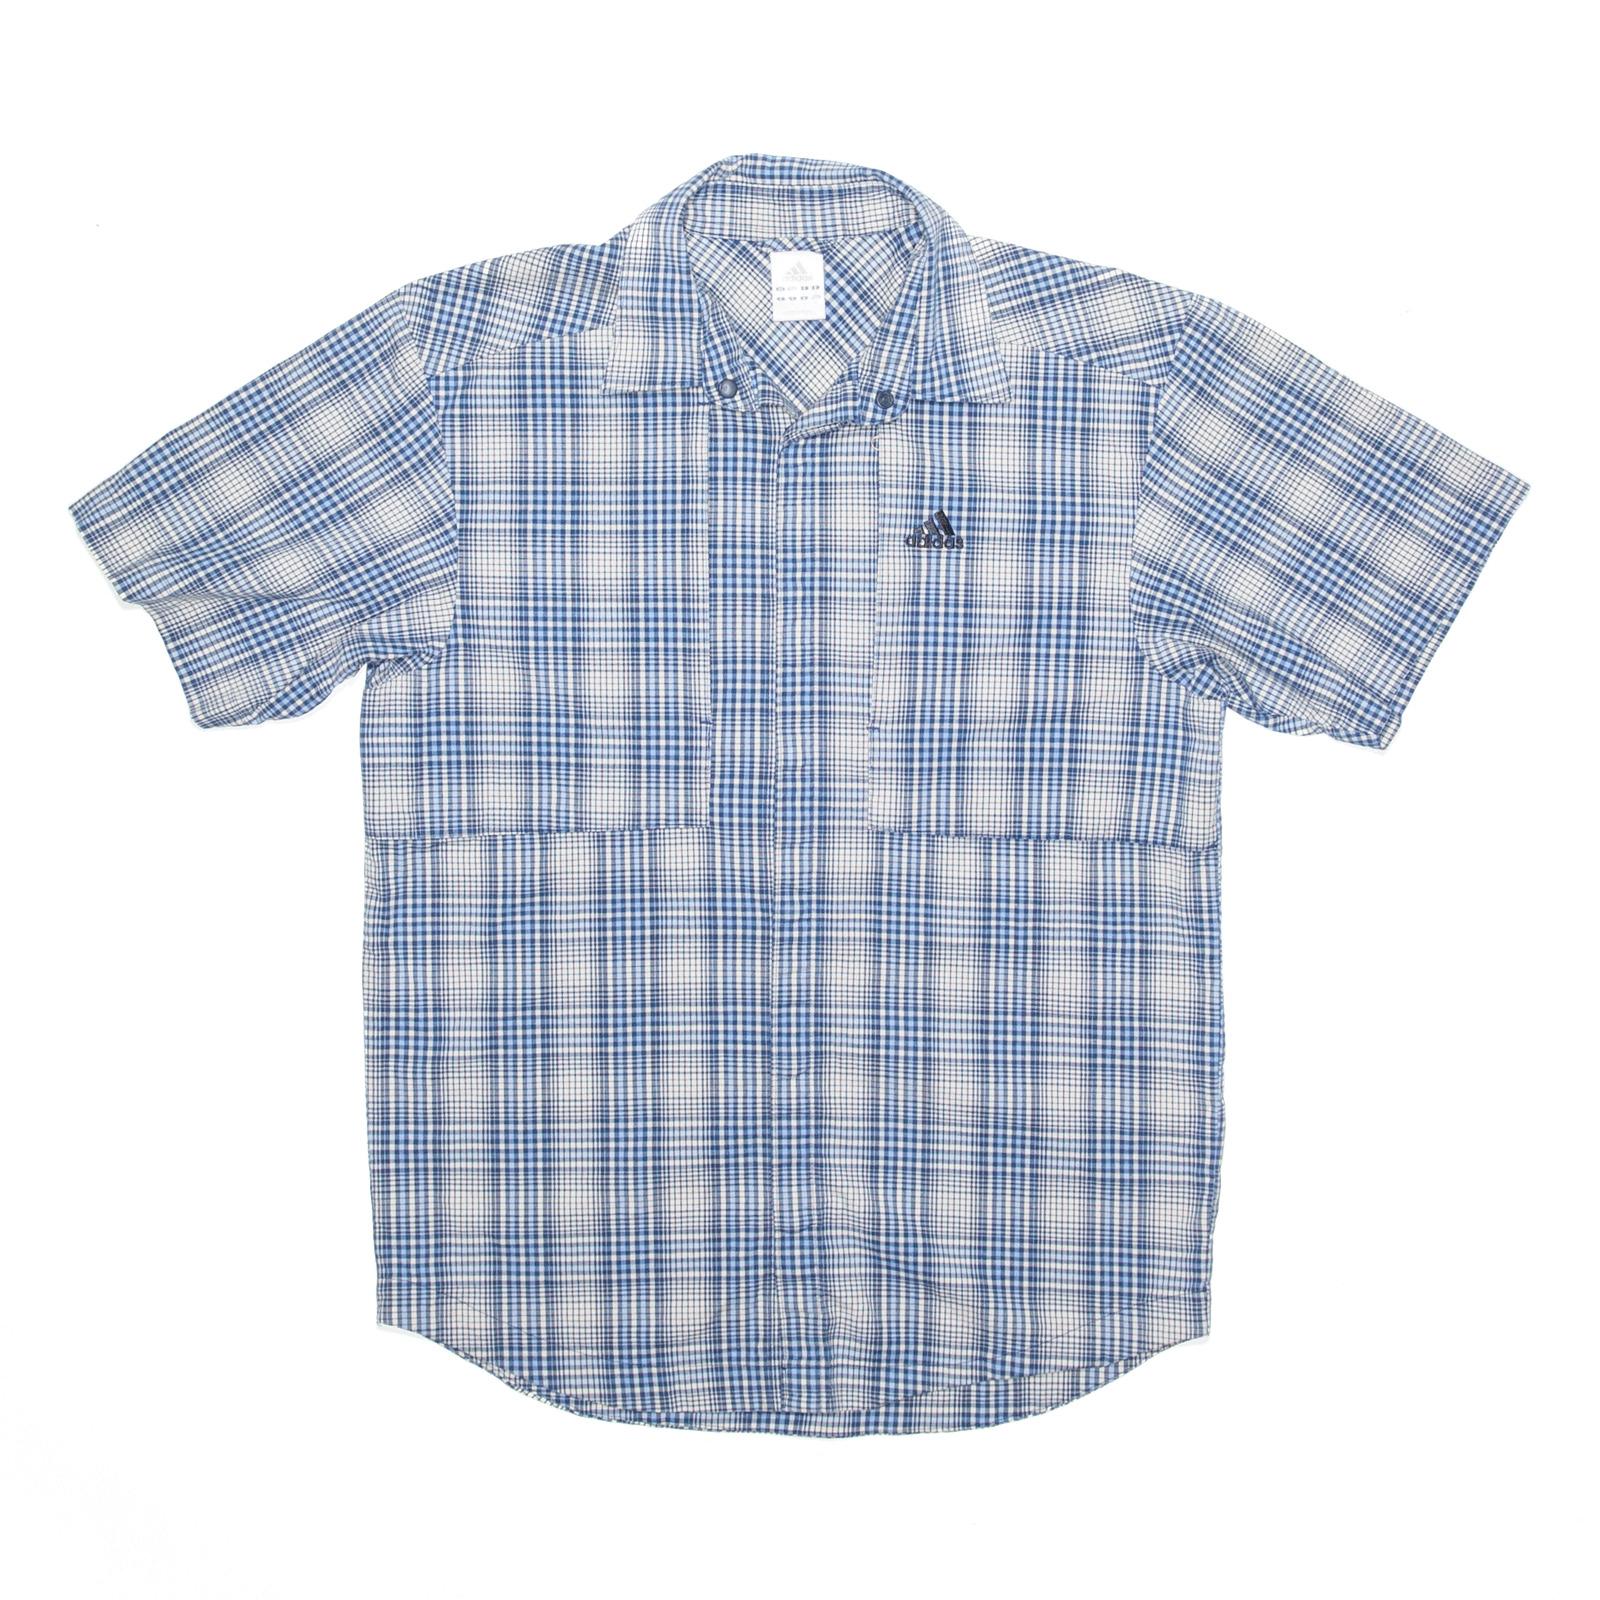 ADIDAS Blue Checked Short Sleeve Shirt Mens S